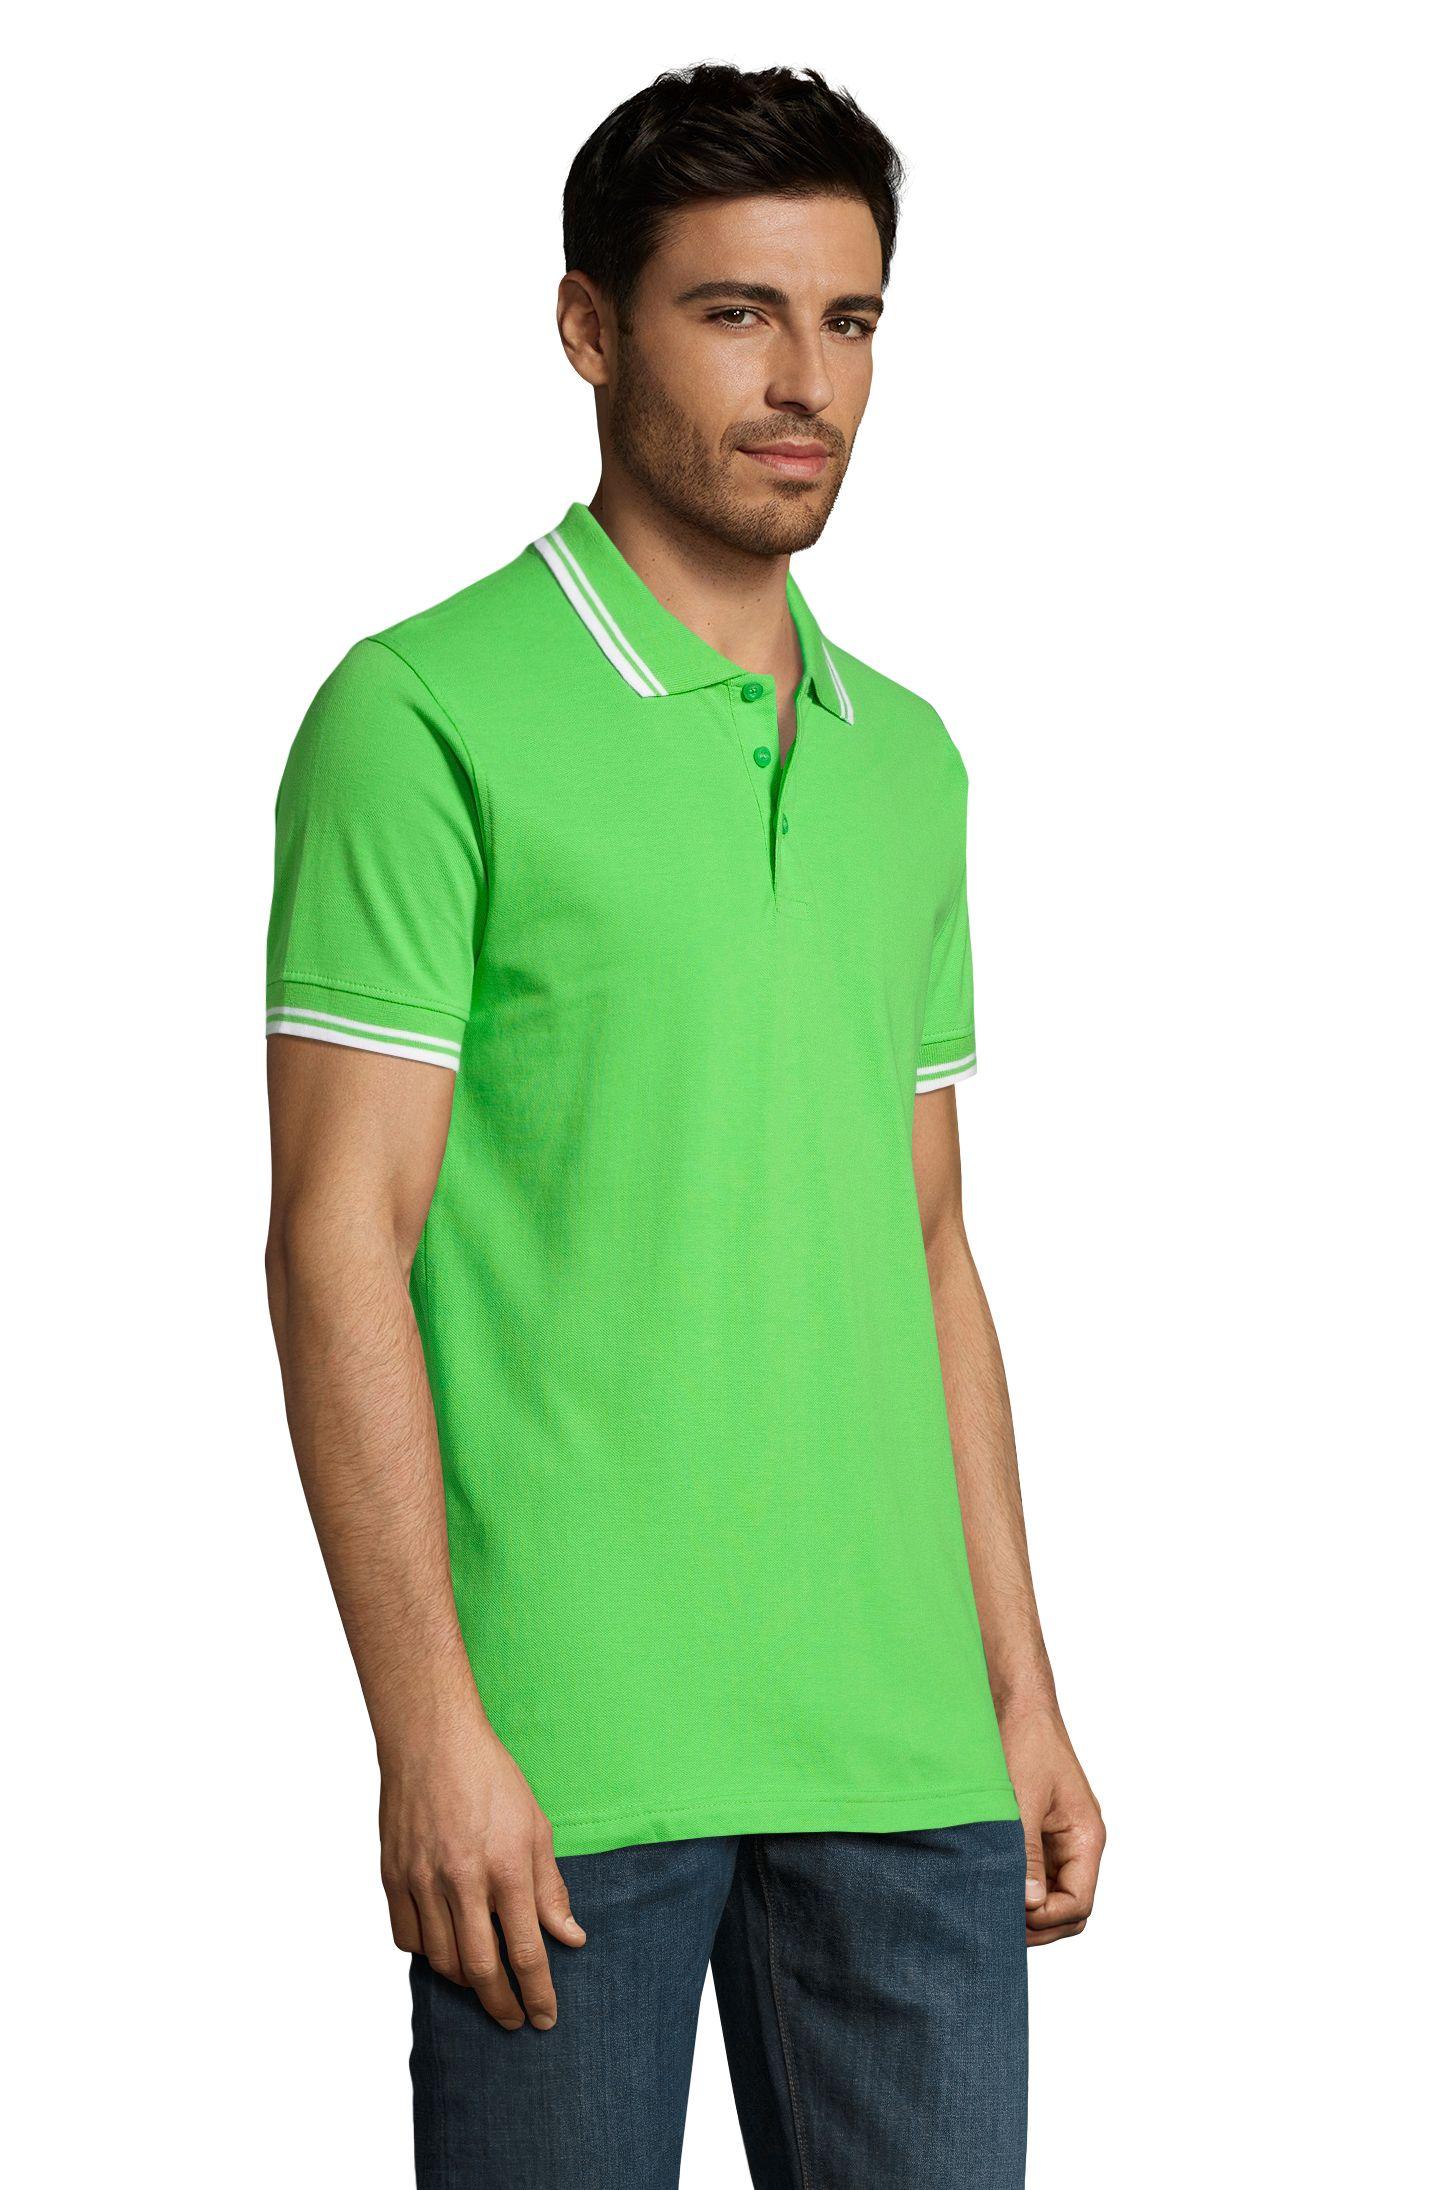 794 - Lime / White